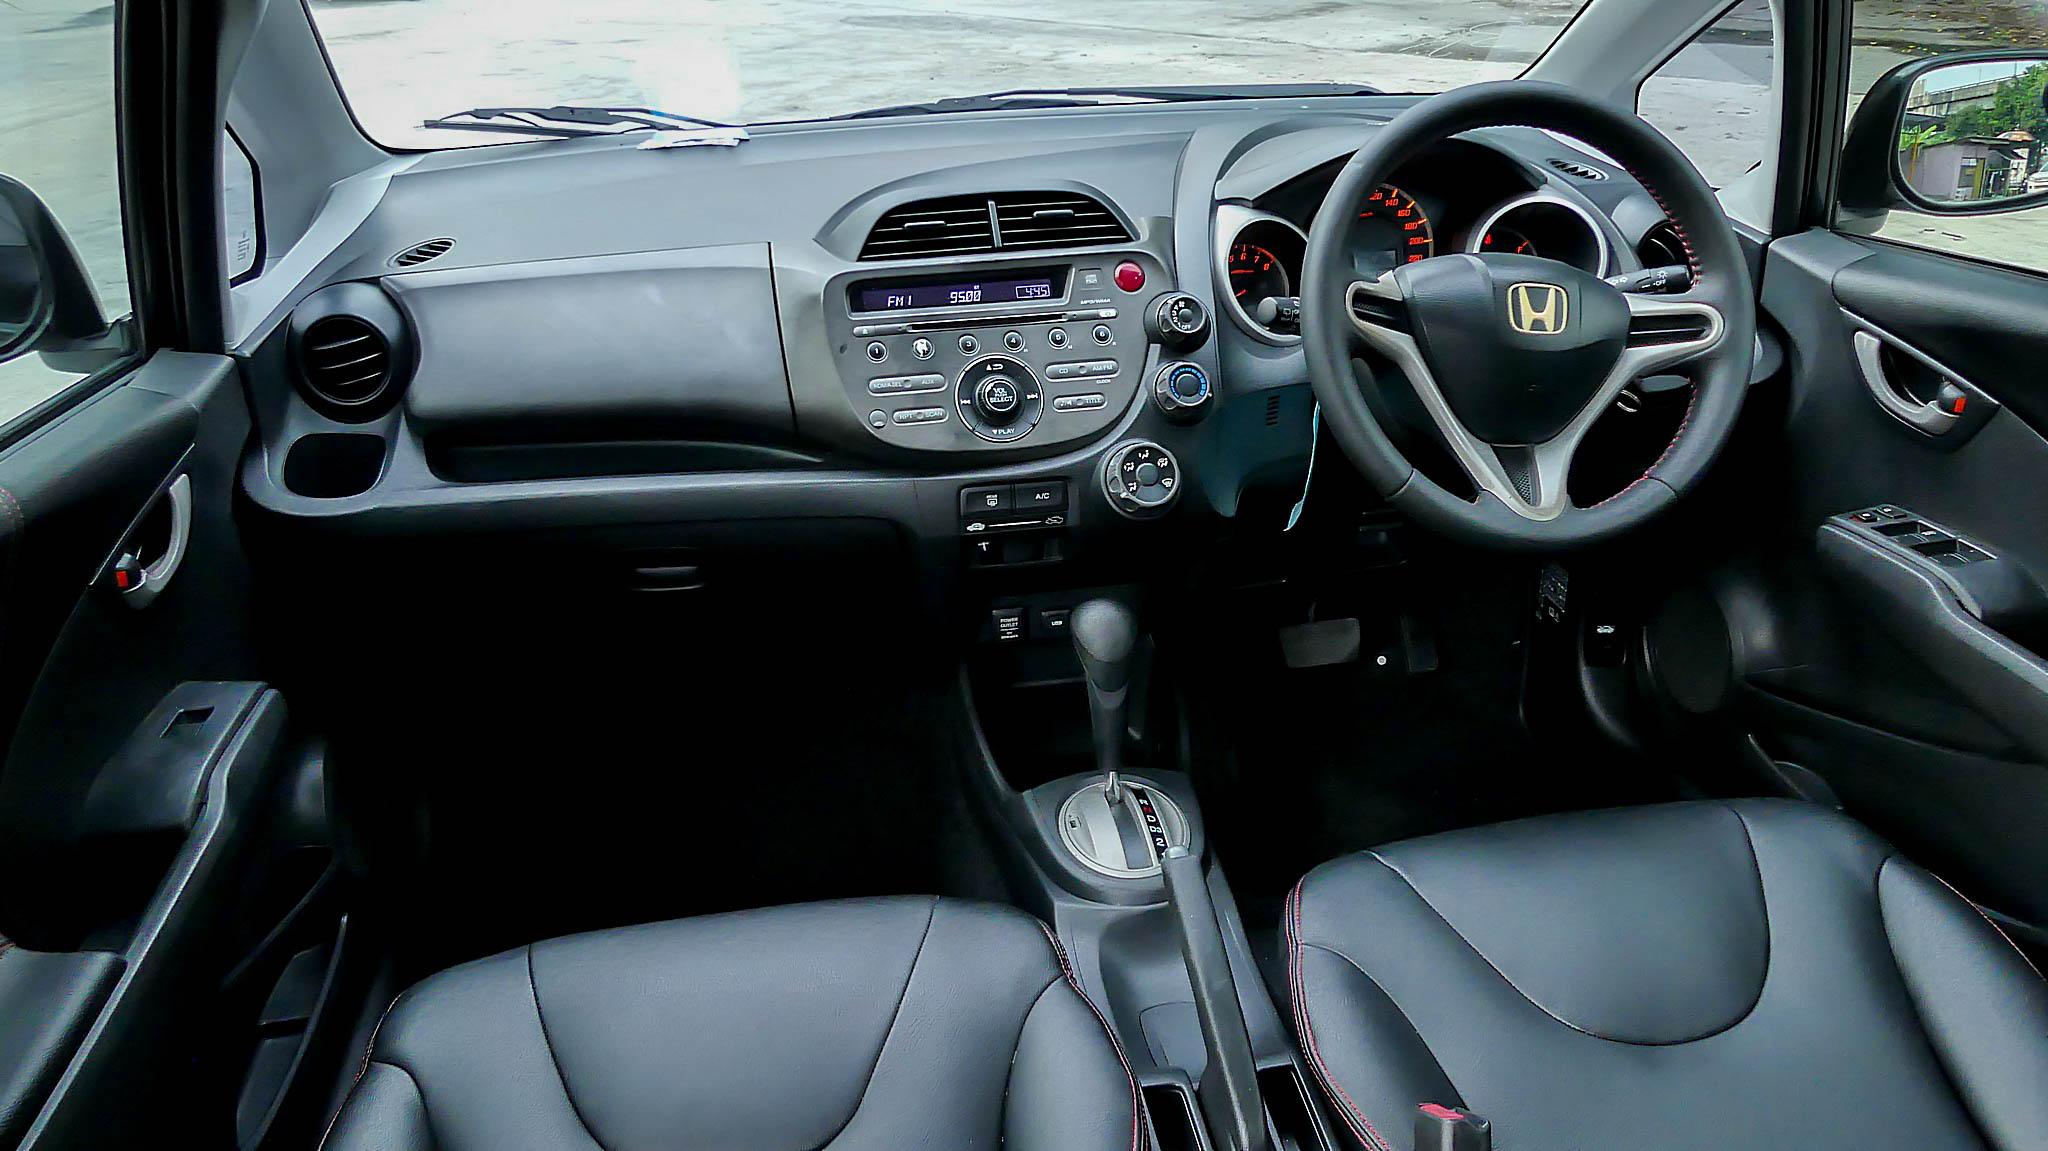 Honda Jazz 1.5 S / AT ปี 2008